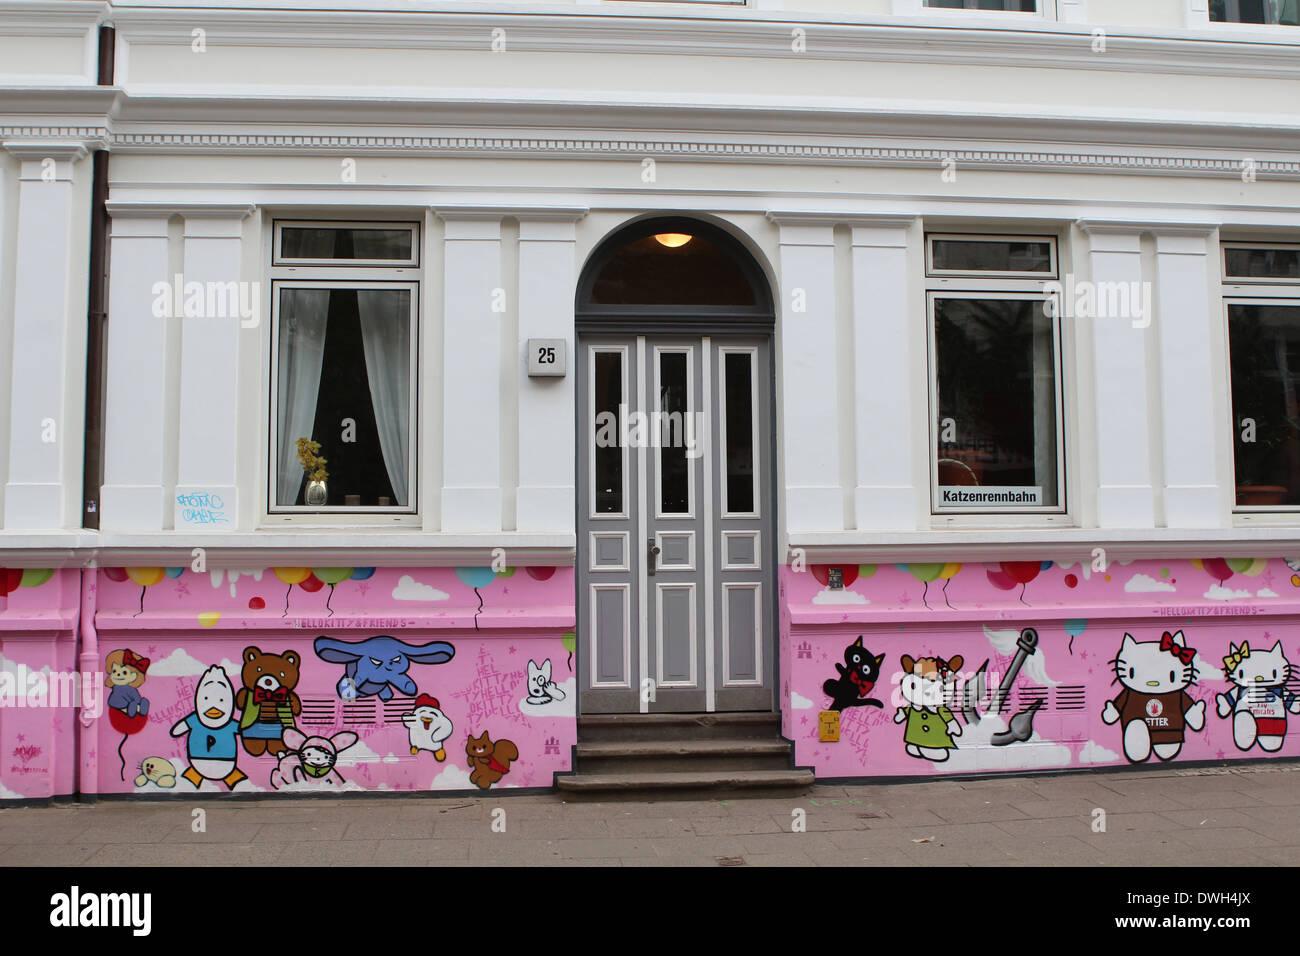 House with fairy tale decoration in Ottensen Hamburg graffiti - Stock Image